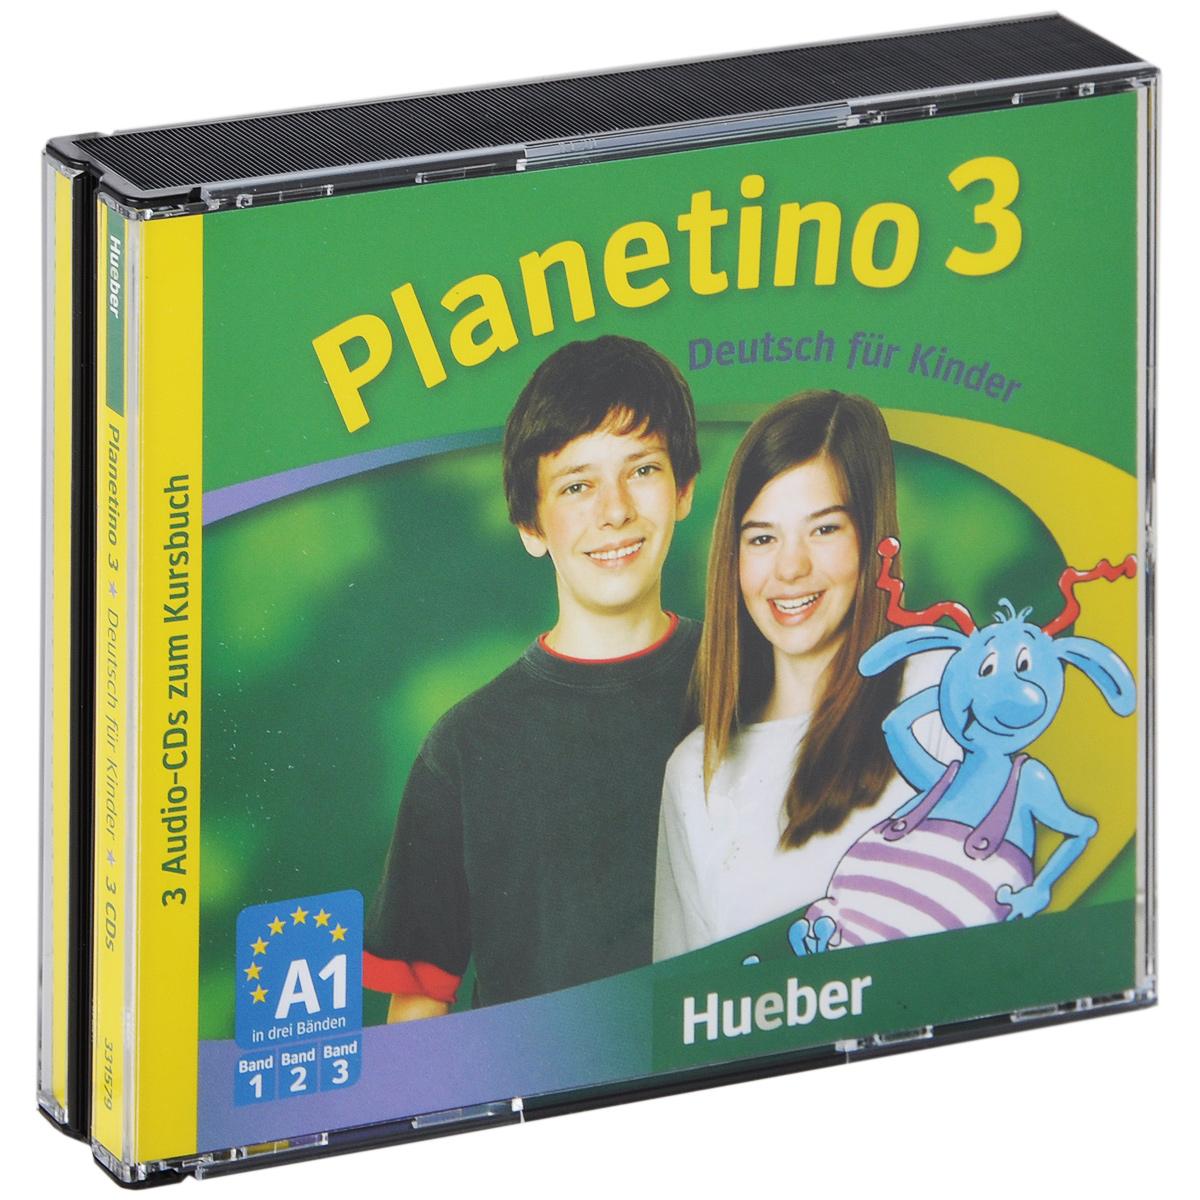 Planetino 3: Deutsch fur Kinder (аудиокурс на 3 CD)